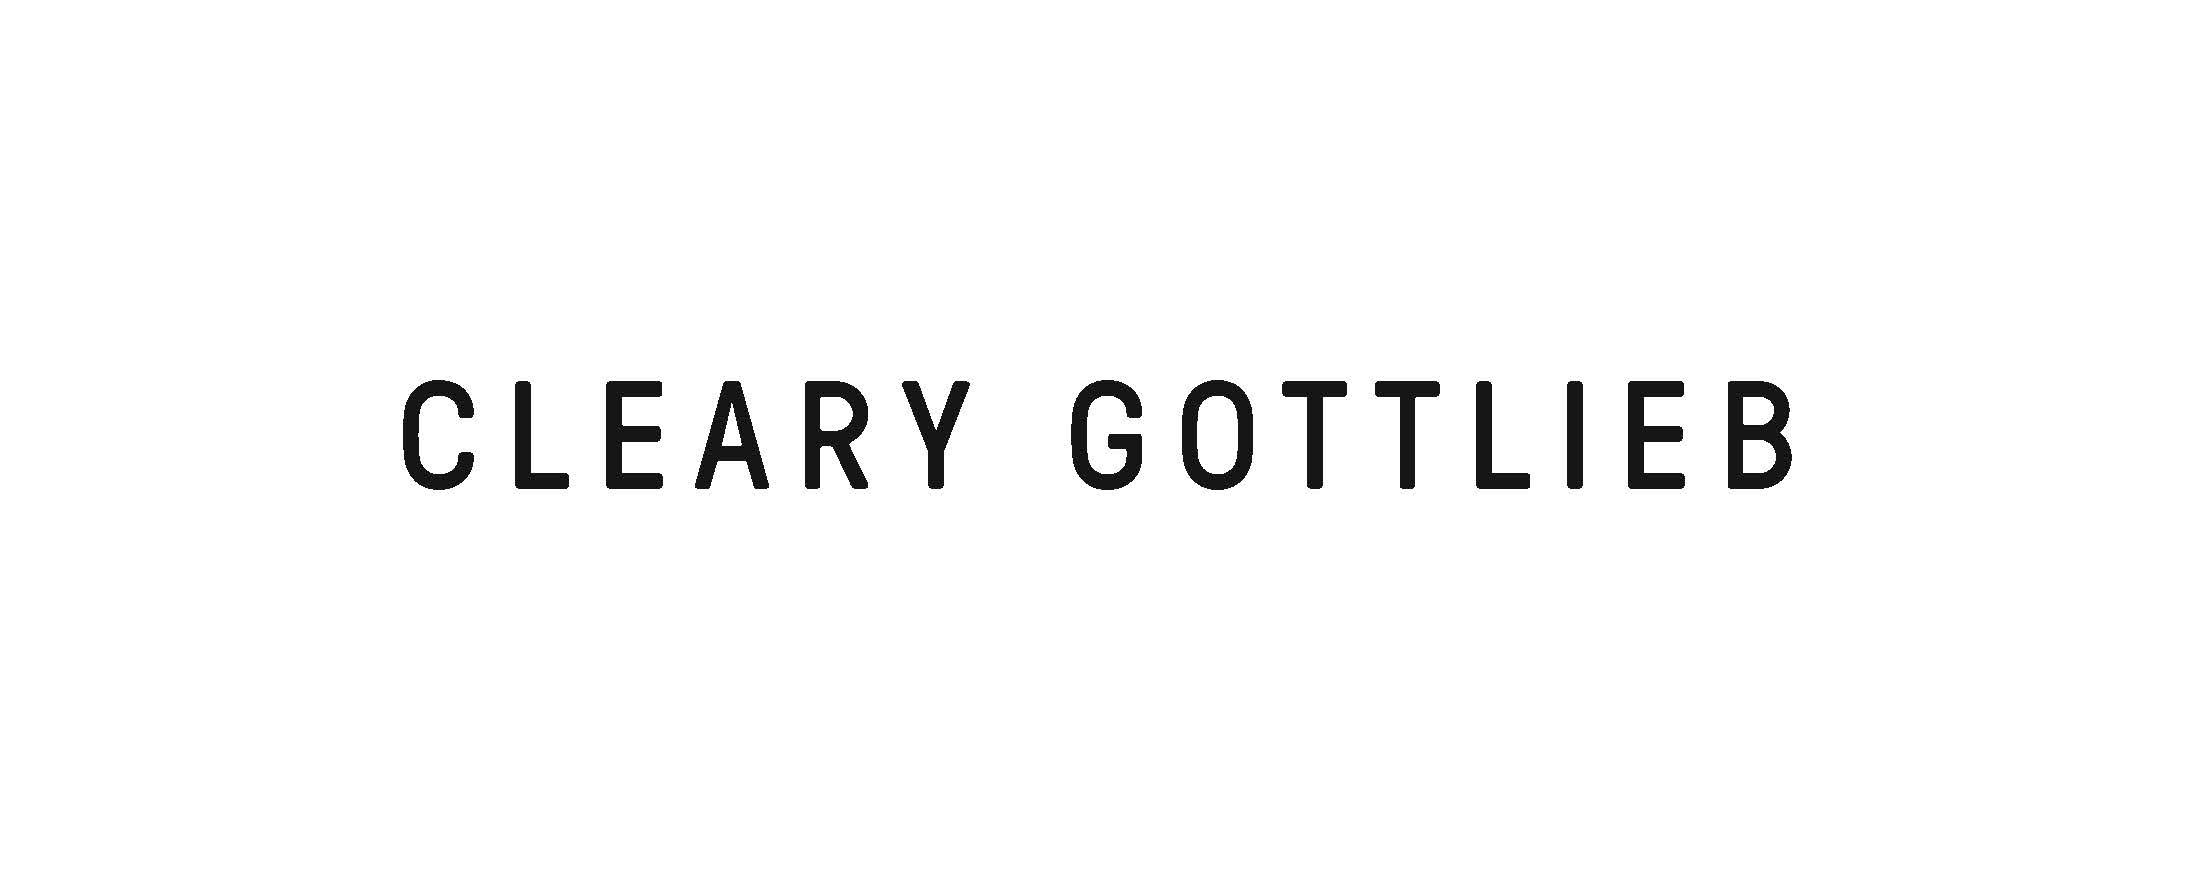 Cleary Gottlieb